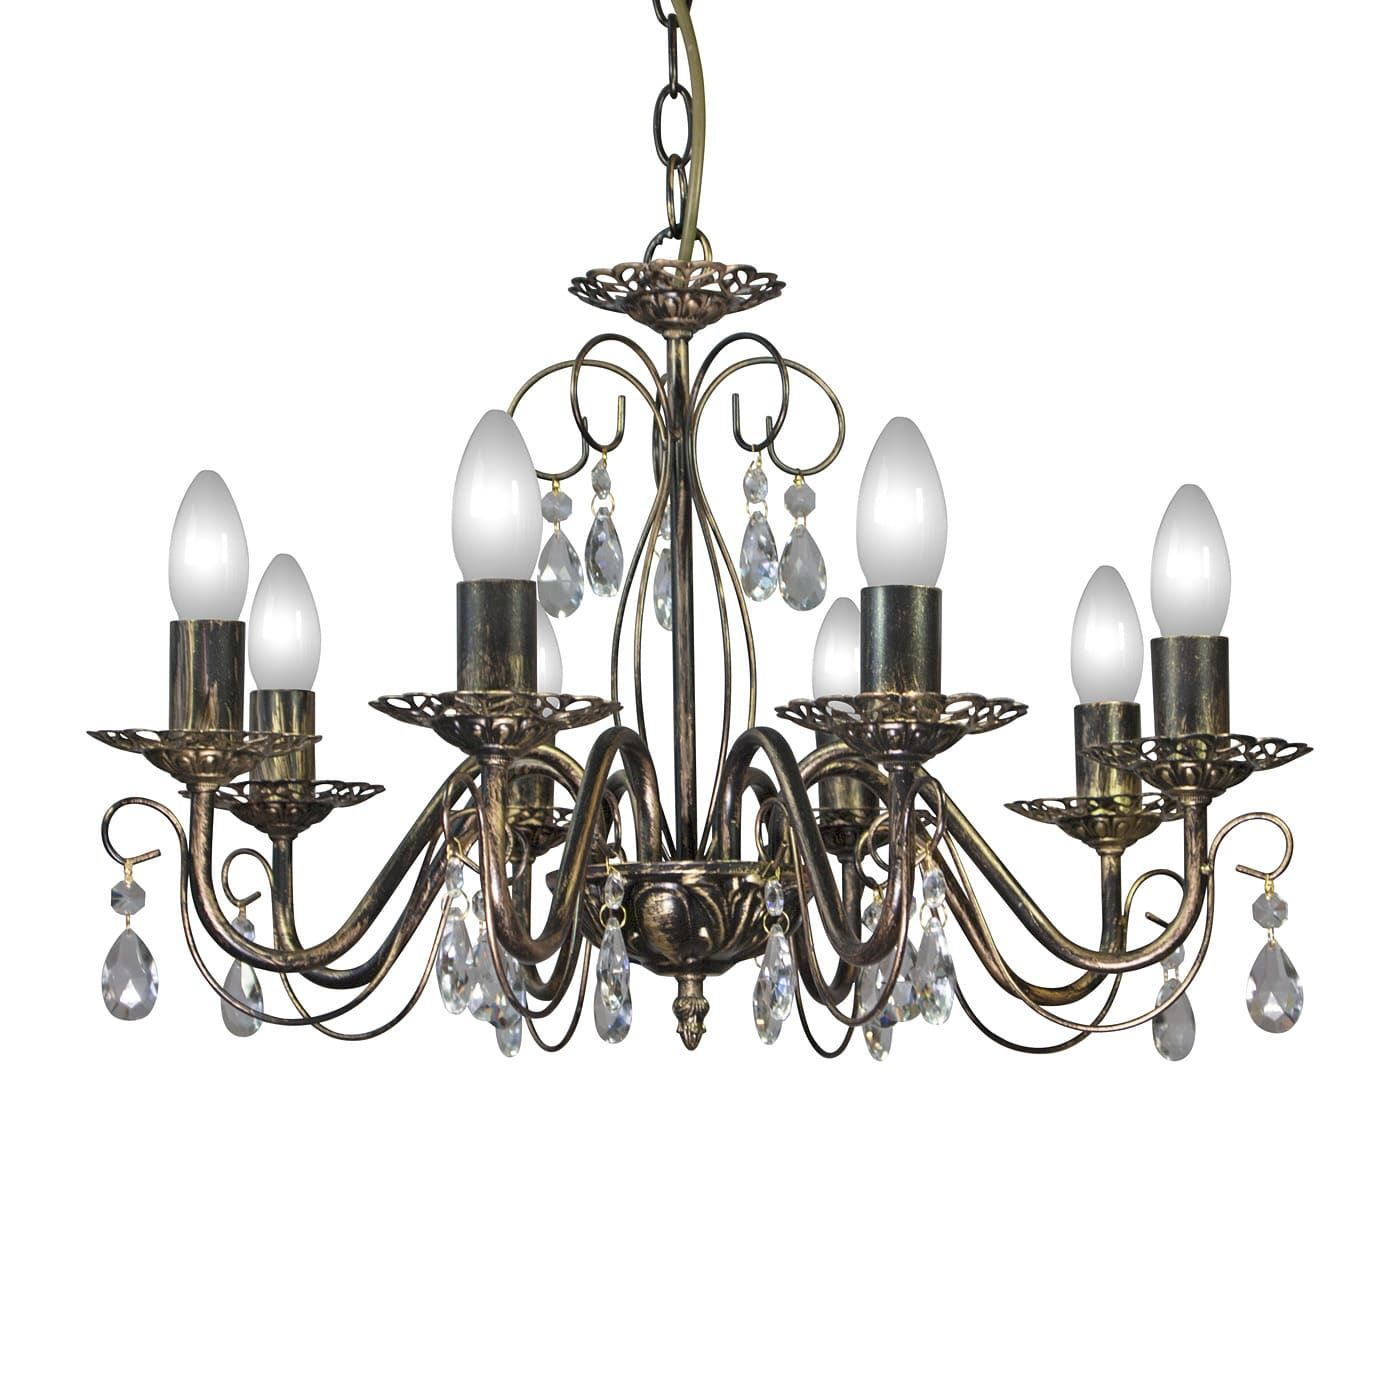 PETRASVET / Pendant chandelier S8067-8, 8xE14 max. 60W